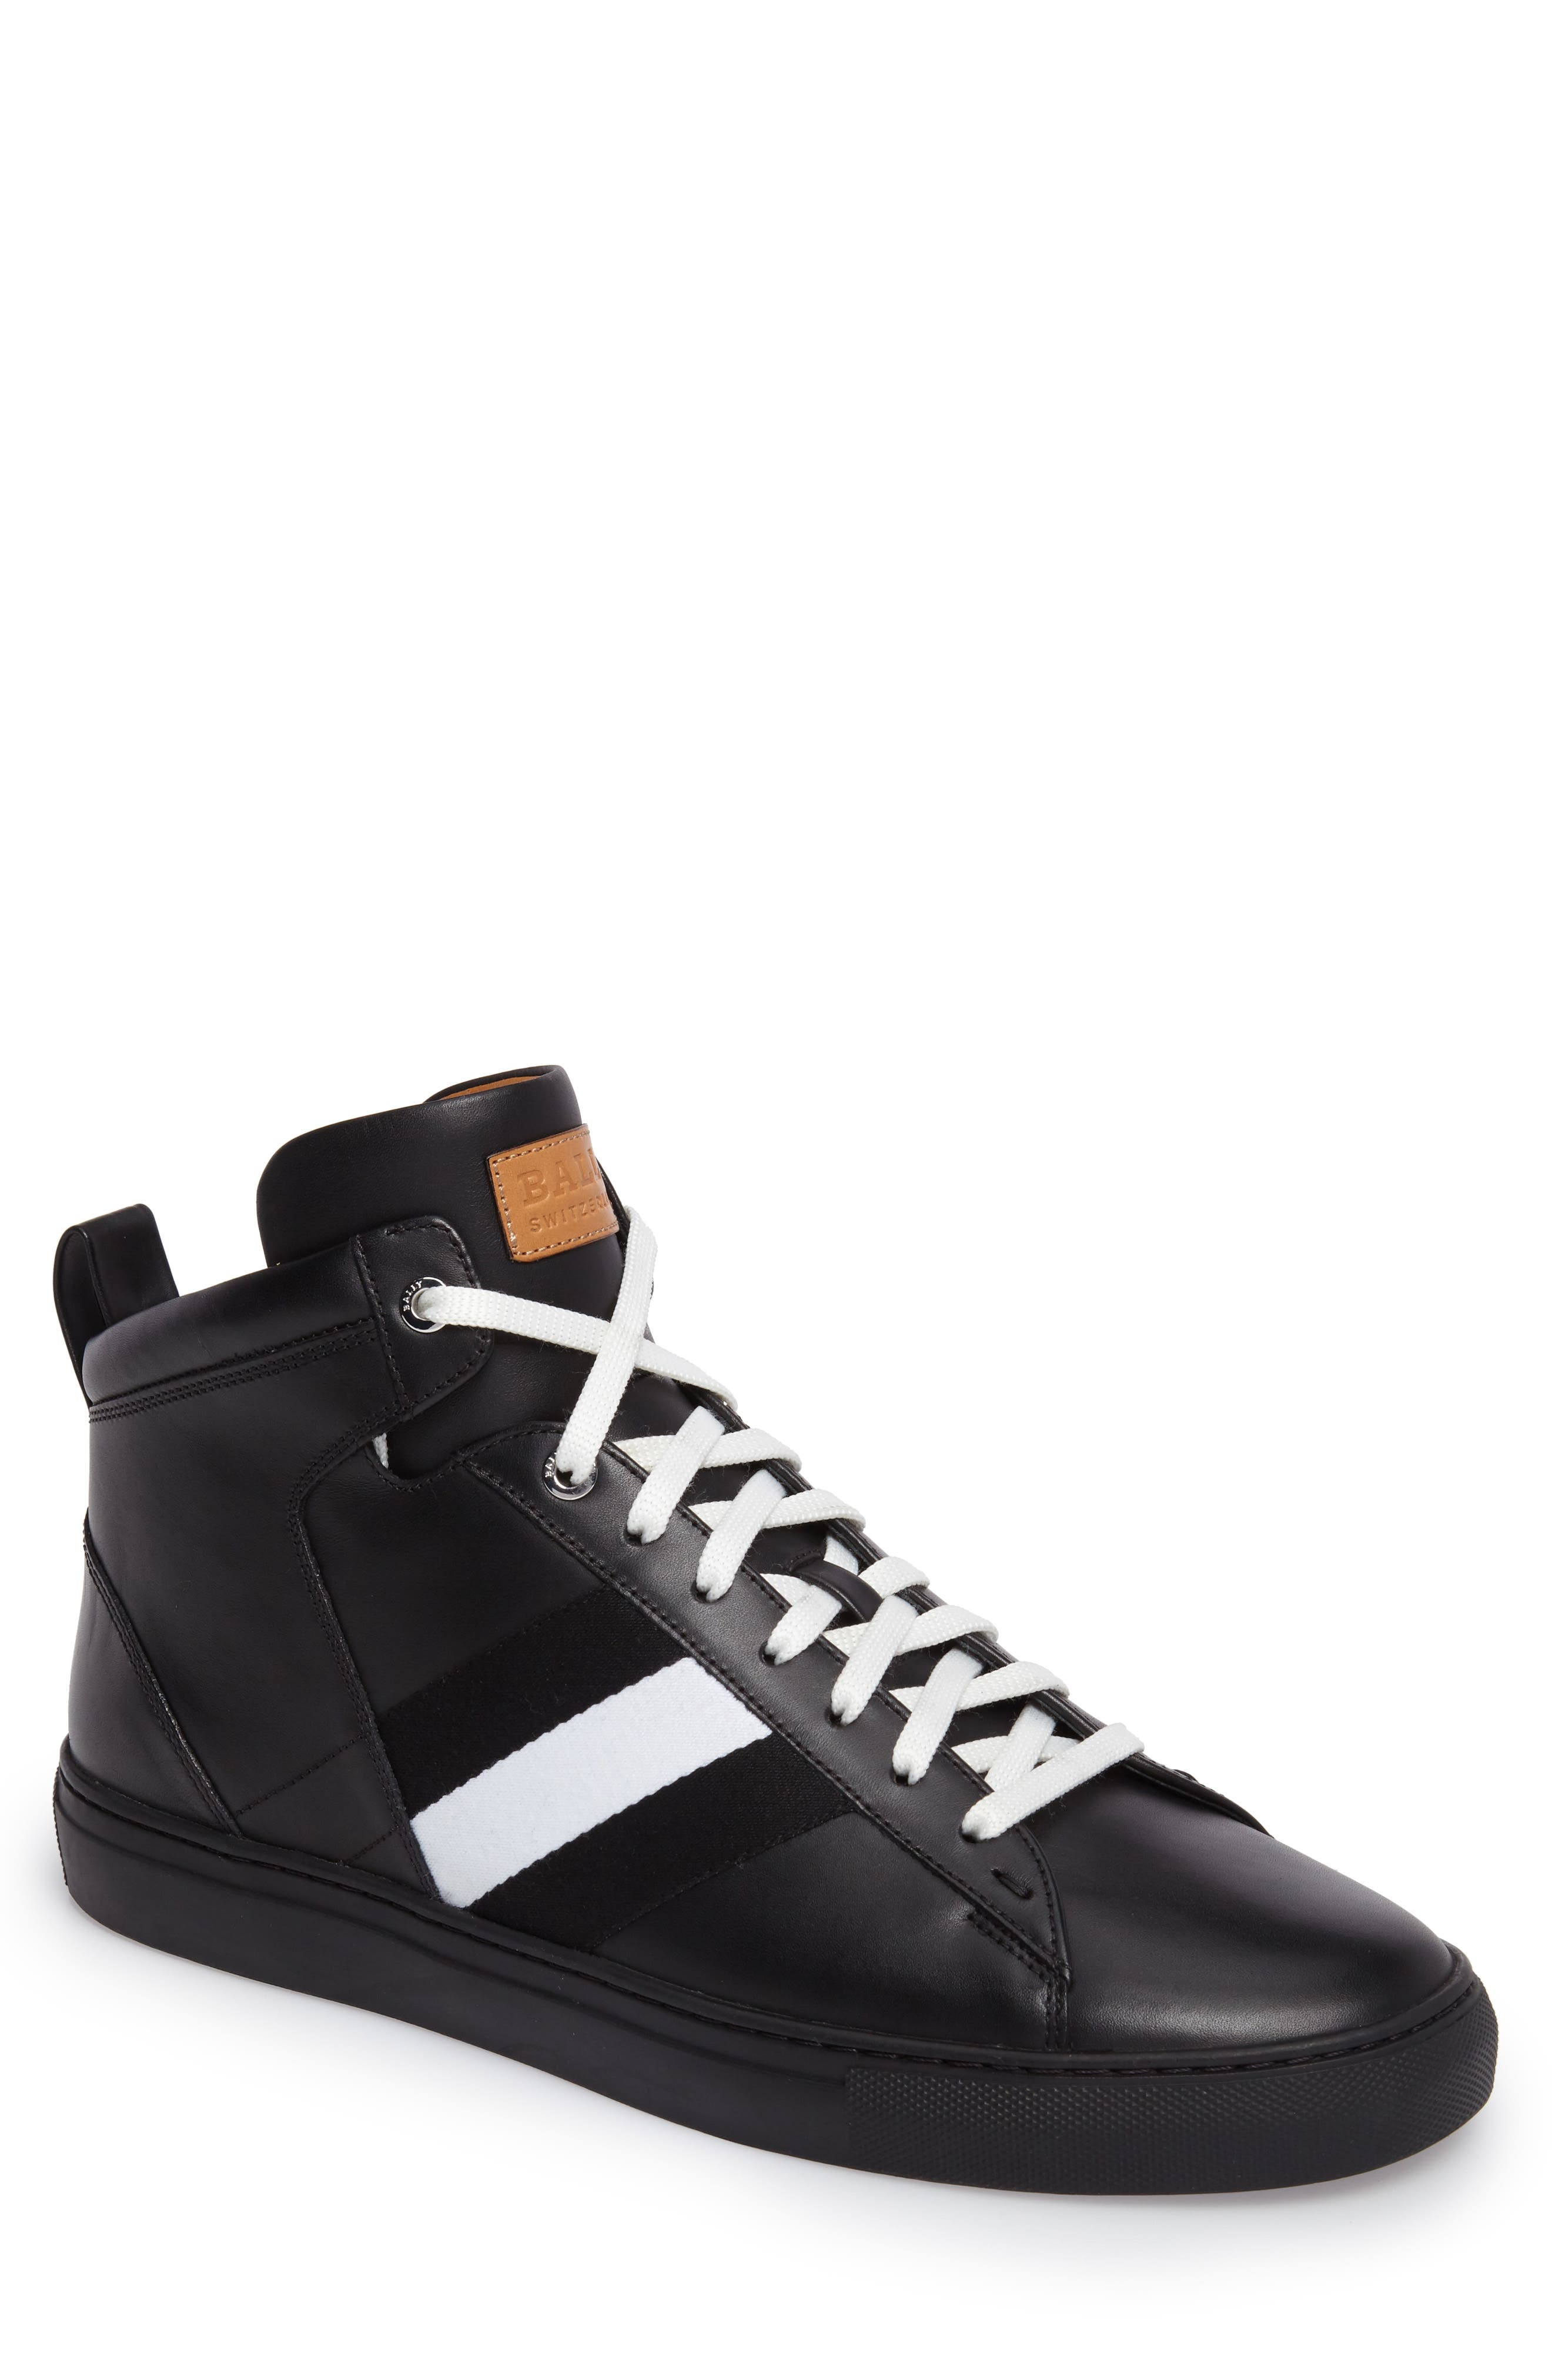 Hedern Sneaker,                             Main thumbnail 1, color,                             001